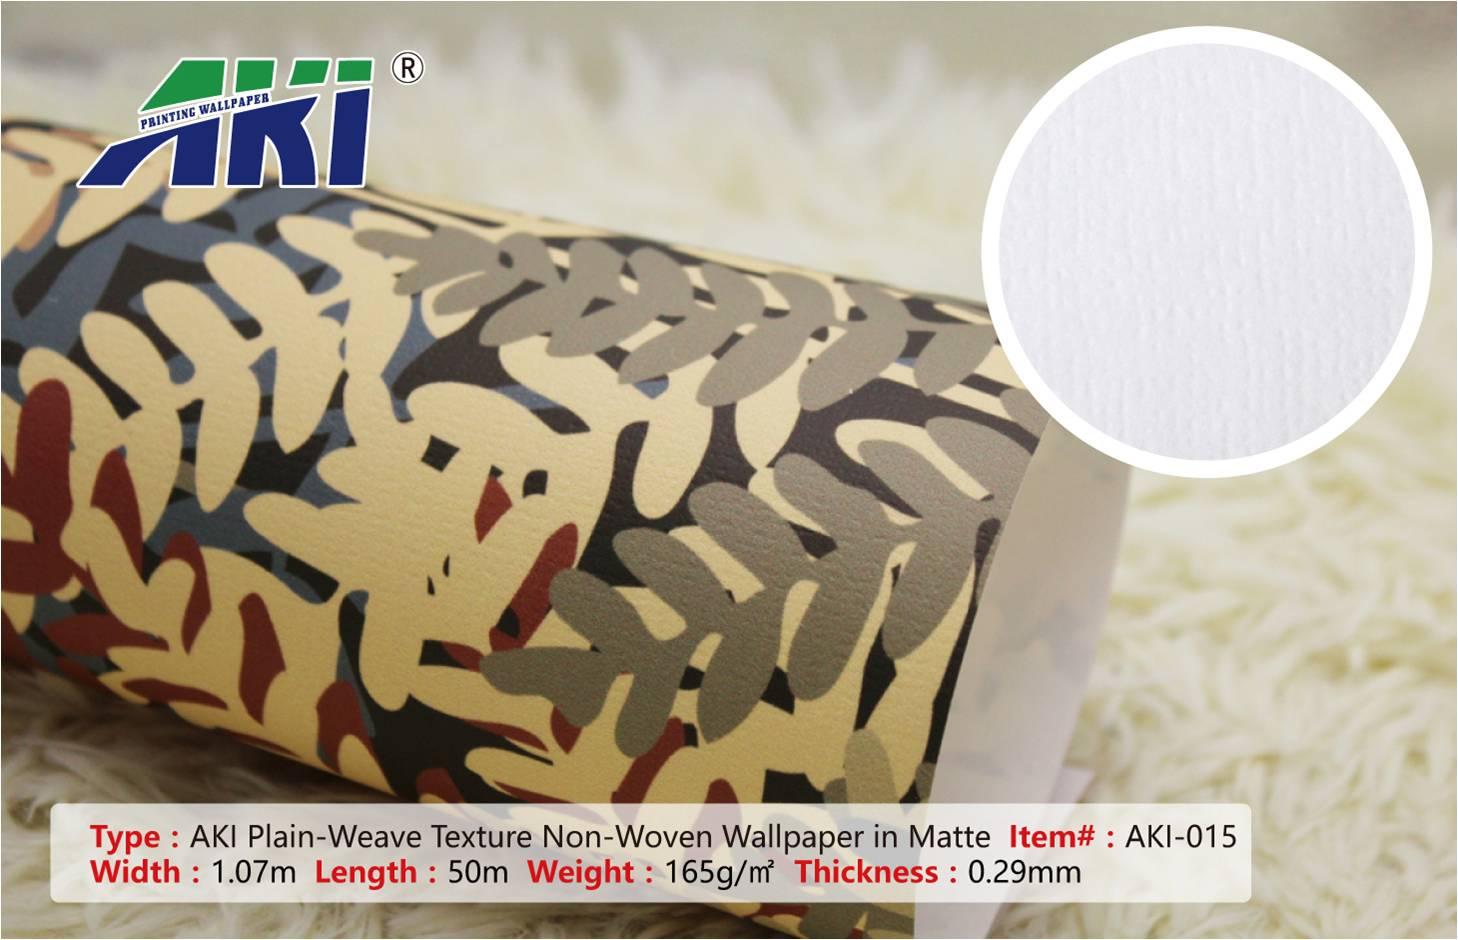 AKI 015 plain-weave texture Non-woven, sticker printable mural, wallpaper home decoration